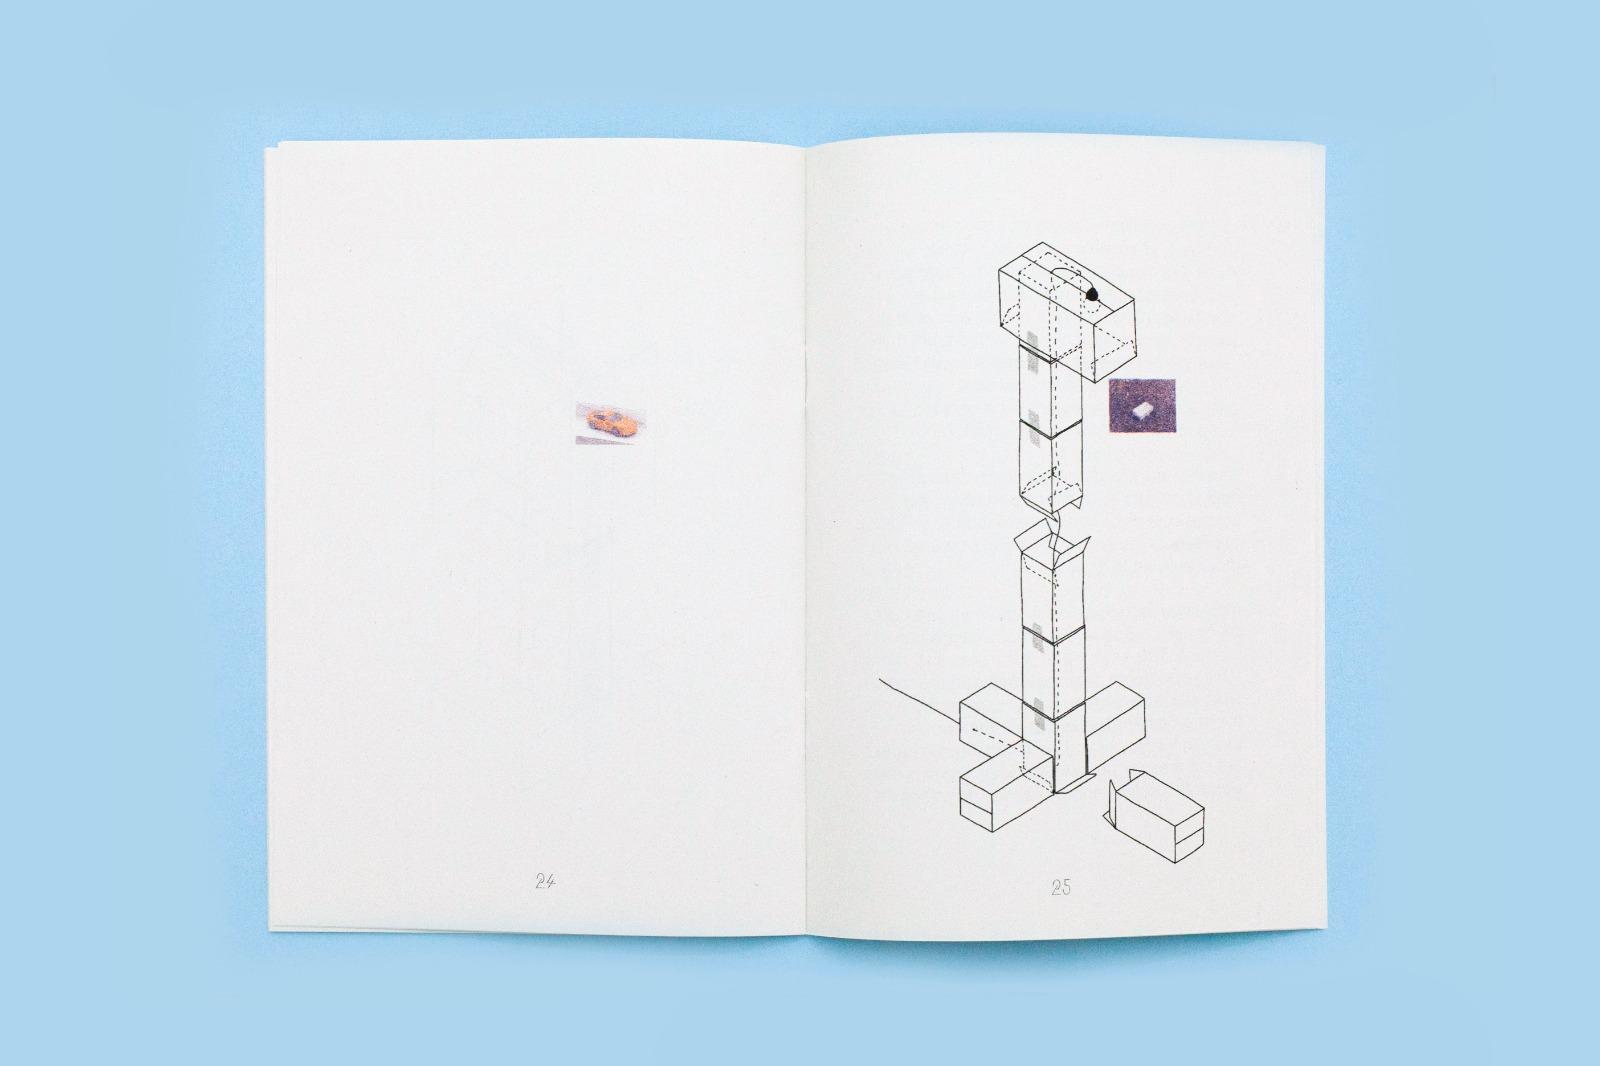 Cardboard Lamps & Adequate Images_book 3